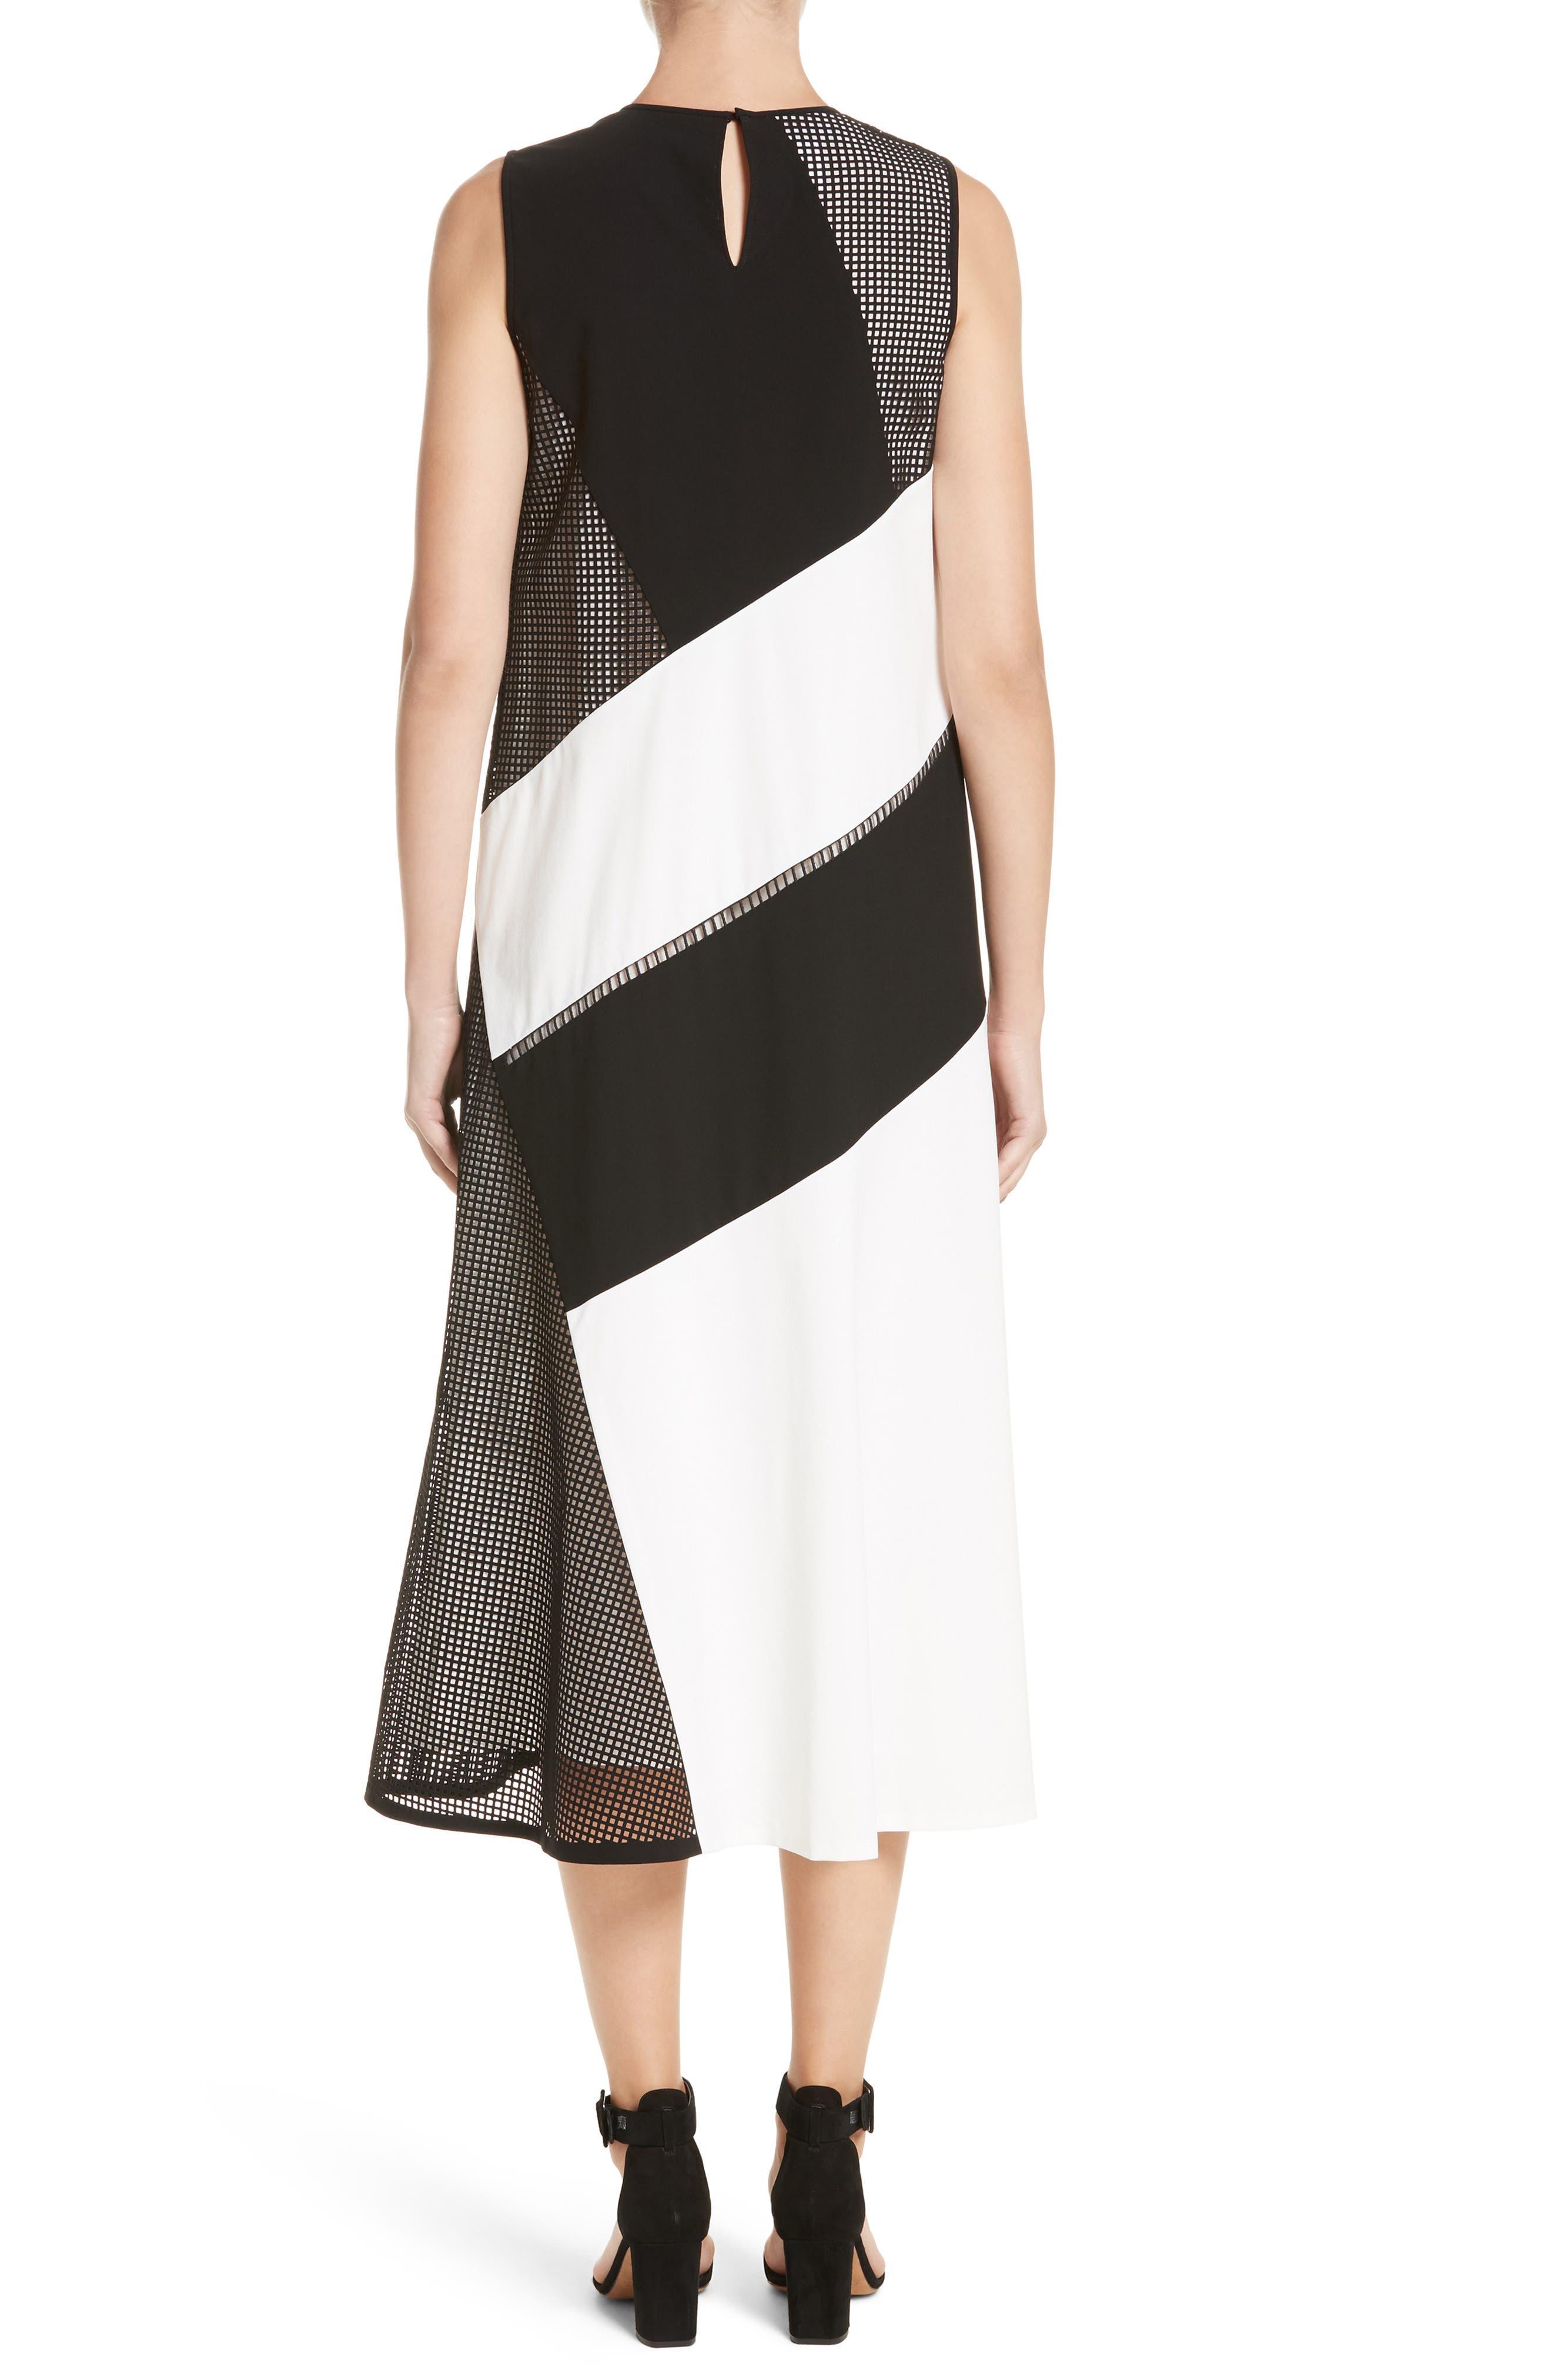 Nuri Laser Cut Midi Dress,                             Alternate thumbnail 2, color,                             Black/Cloud